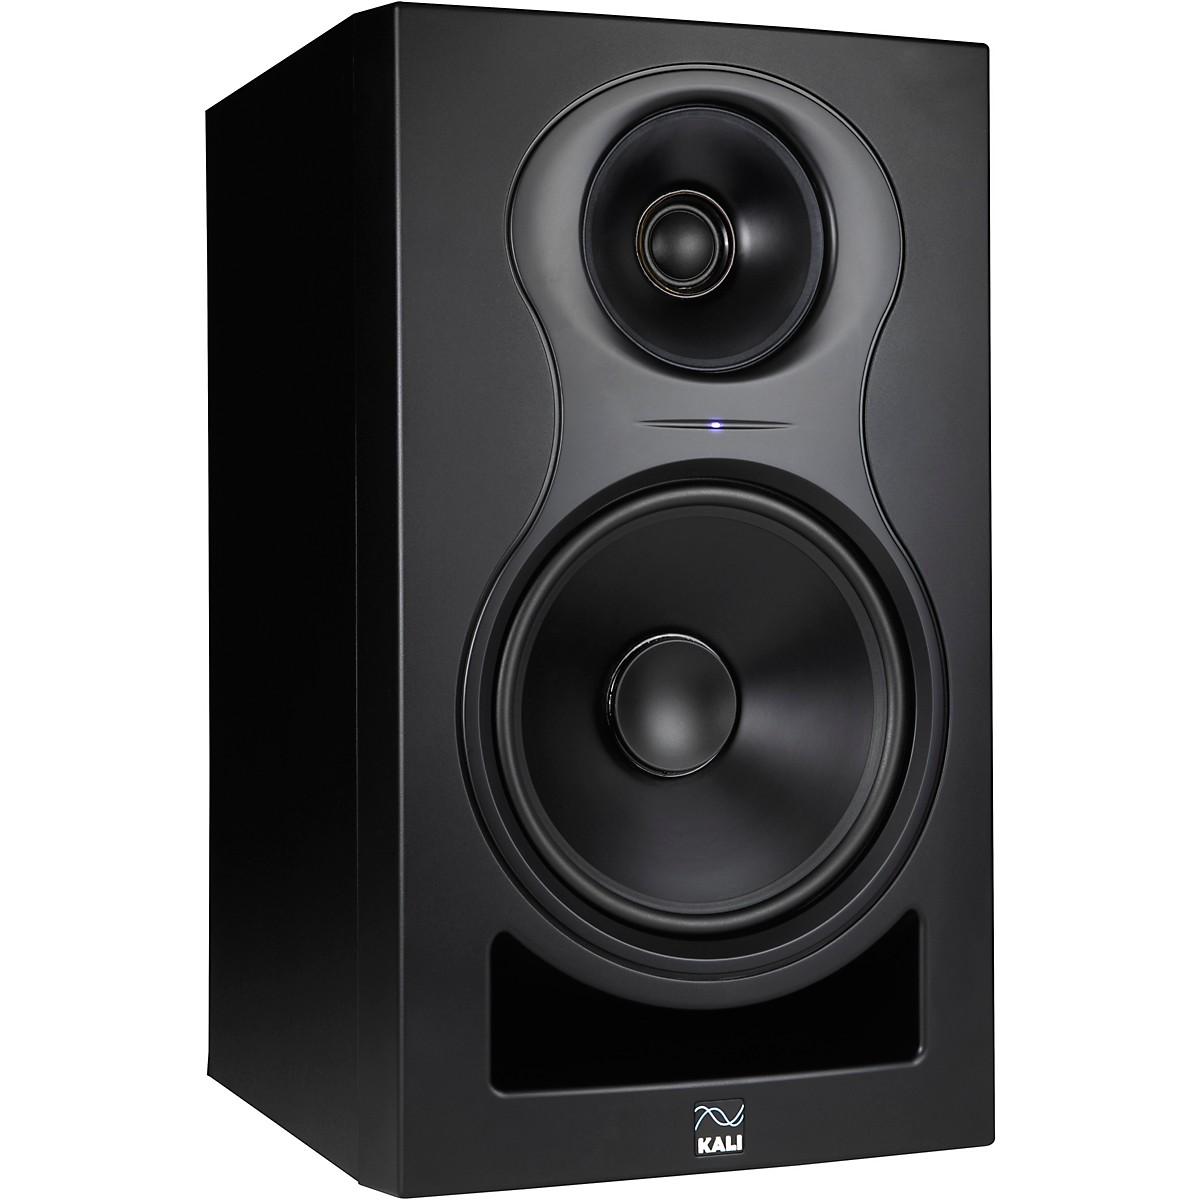 Kali Audio IN-8 8-Inch Active 3-Way Studio Monitor